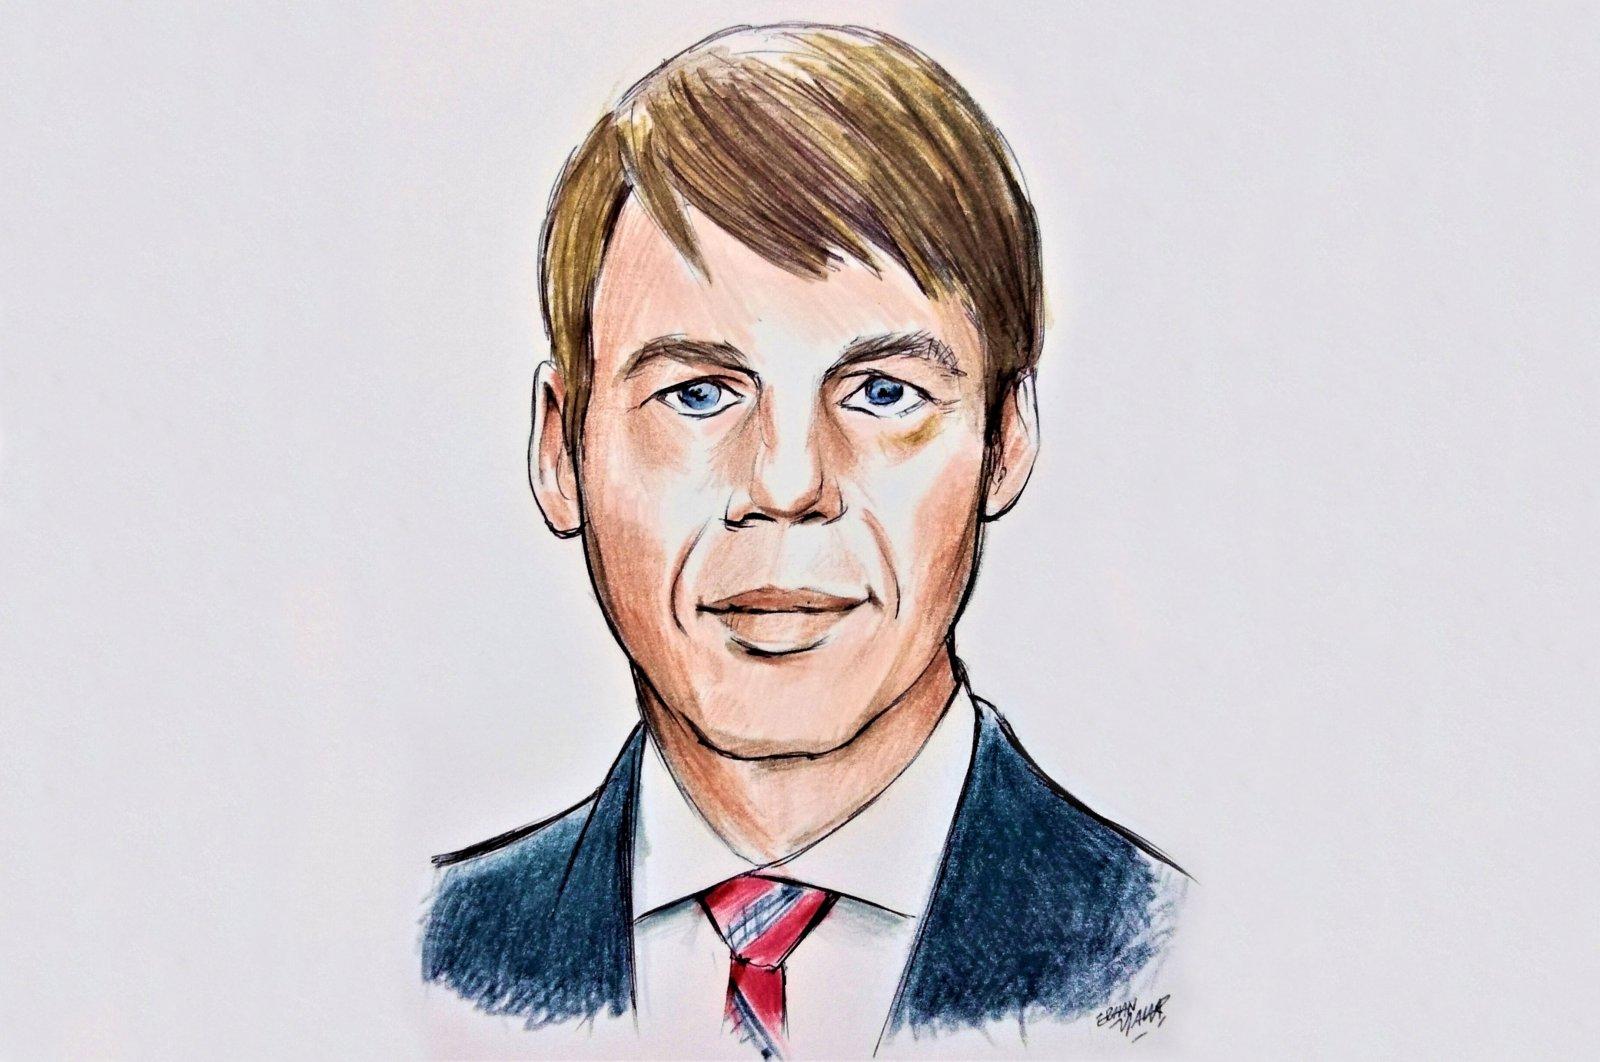 An illustration by Erhan Yalvaç shows a portrait of German diplomat Jan Hecker.